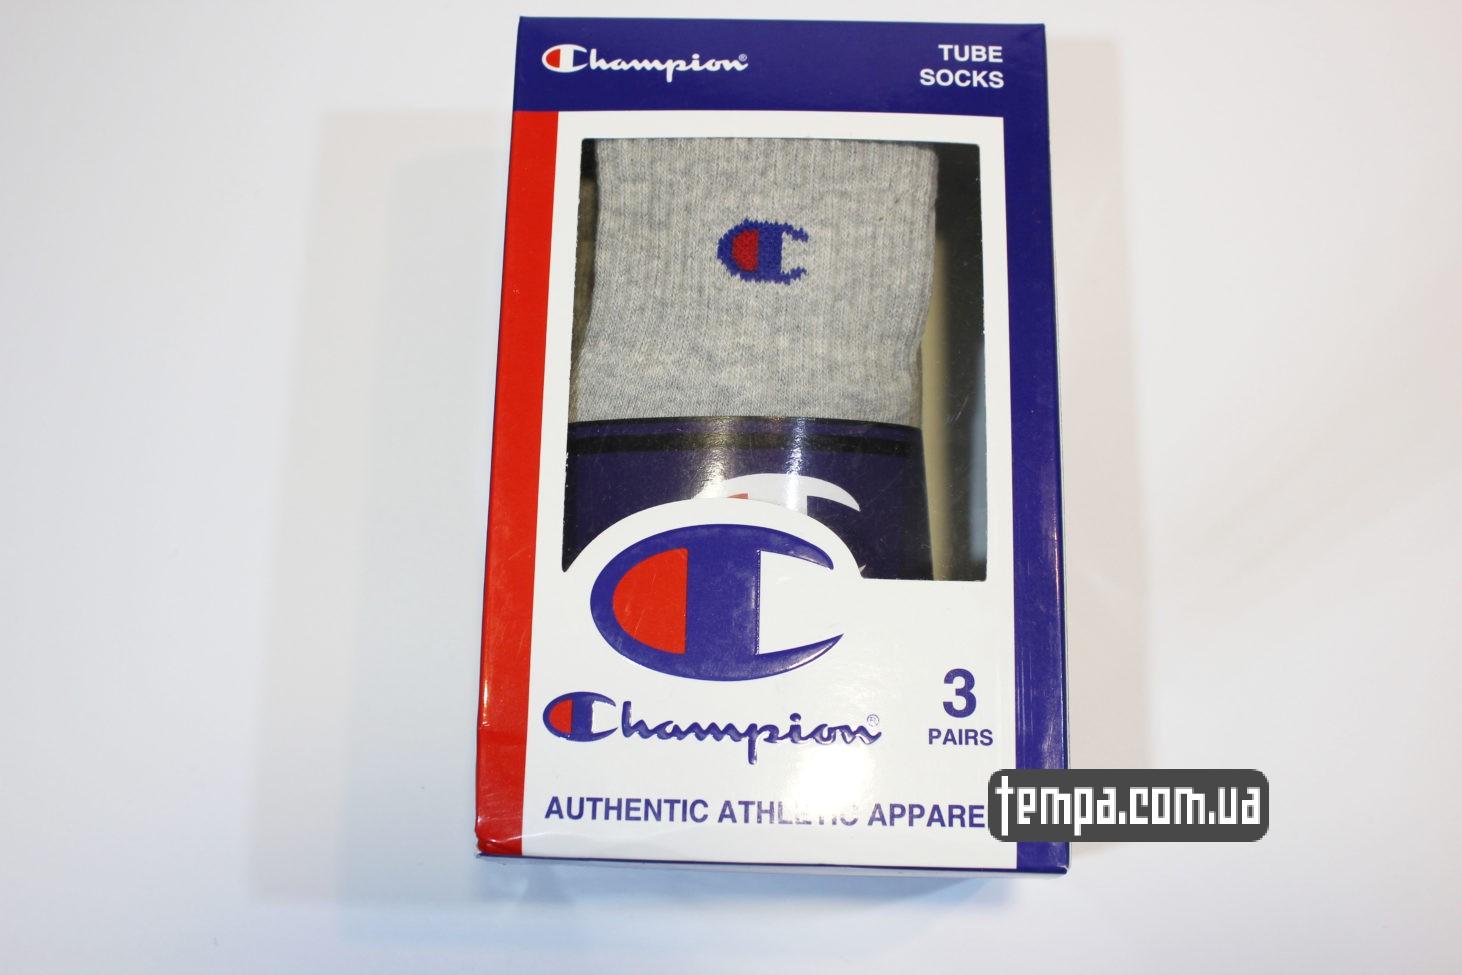 ноские средние champion серые tube socks grey